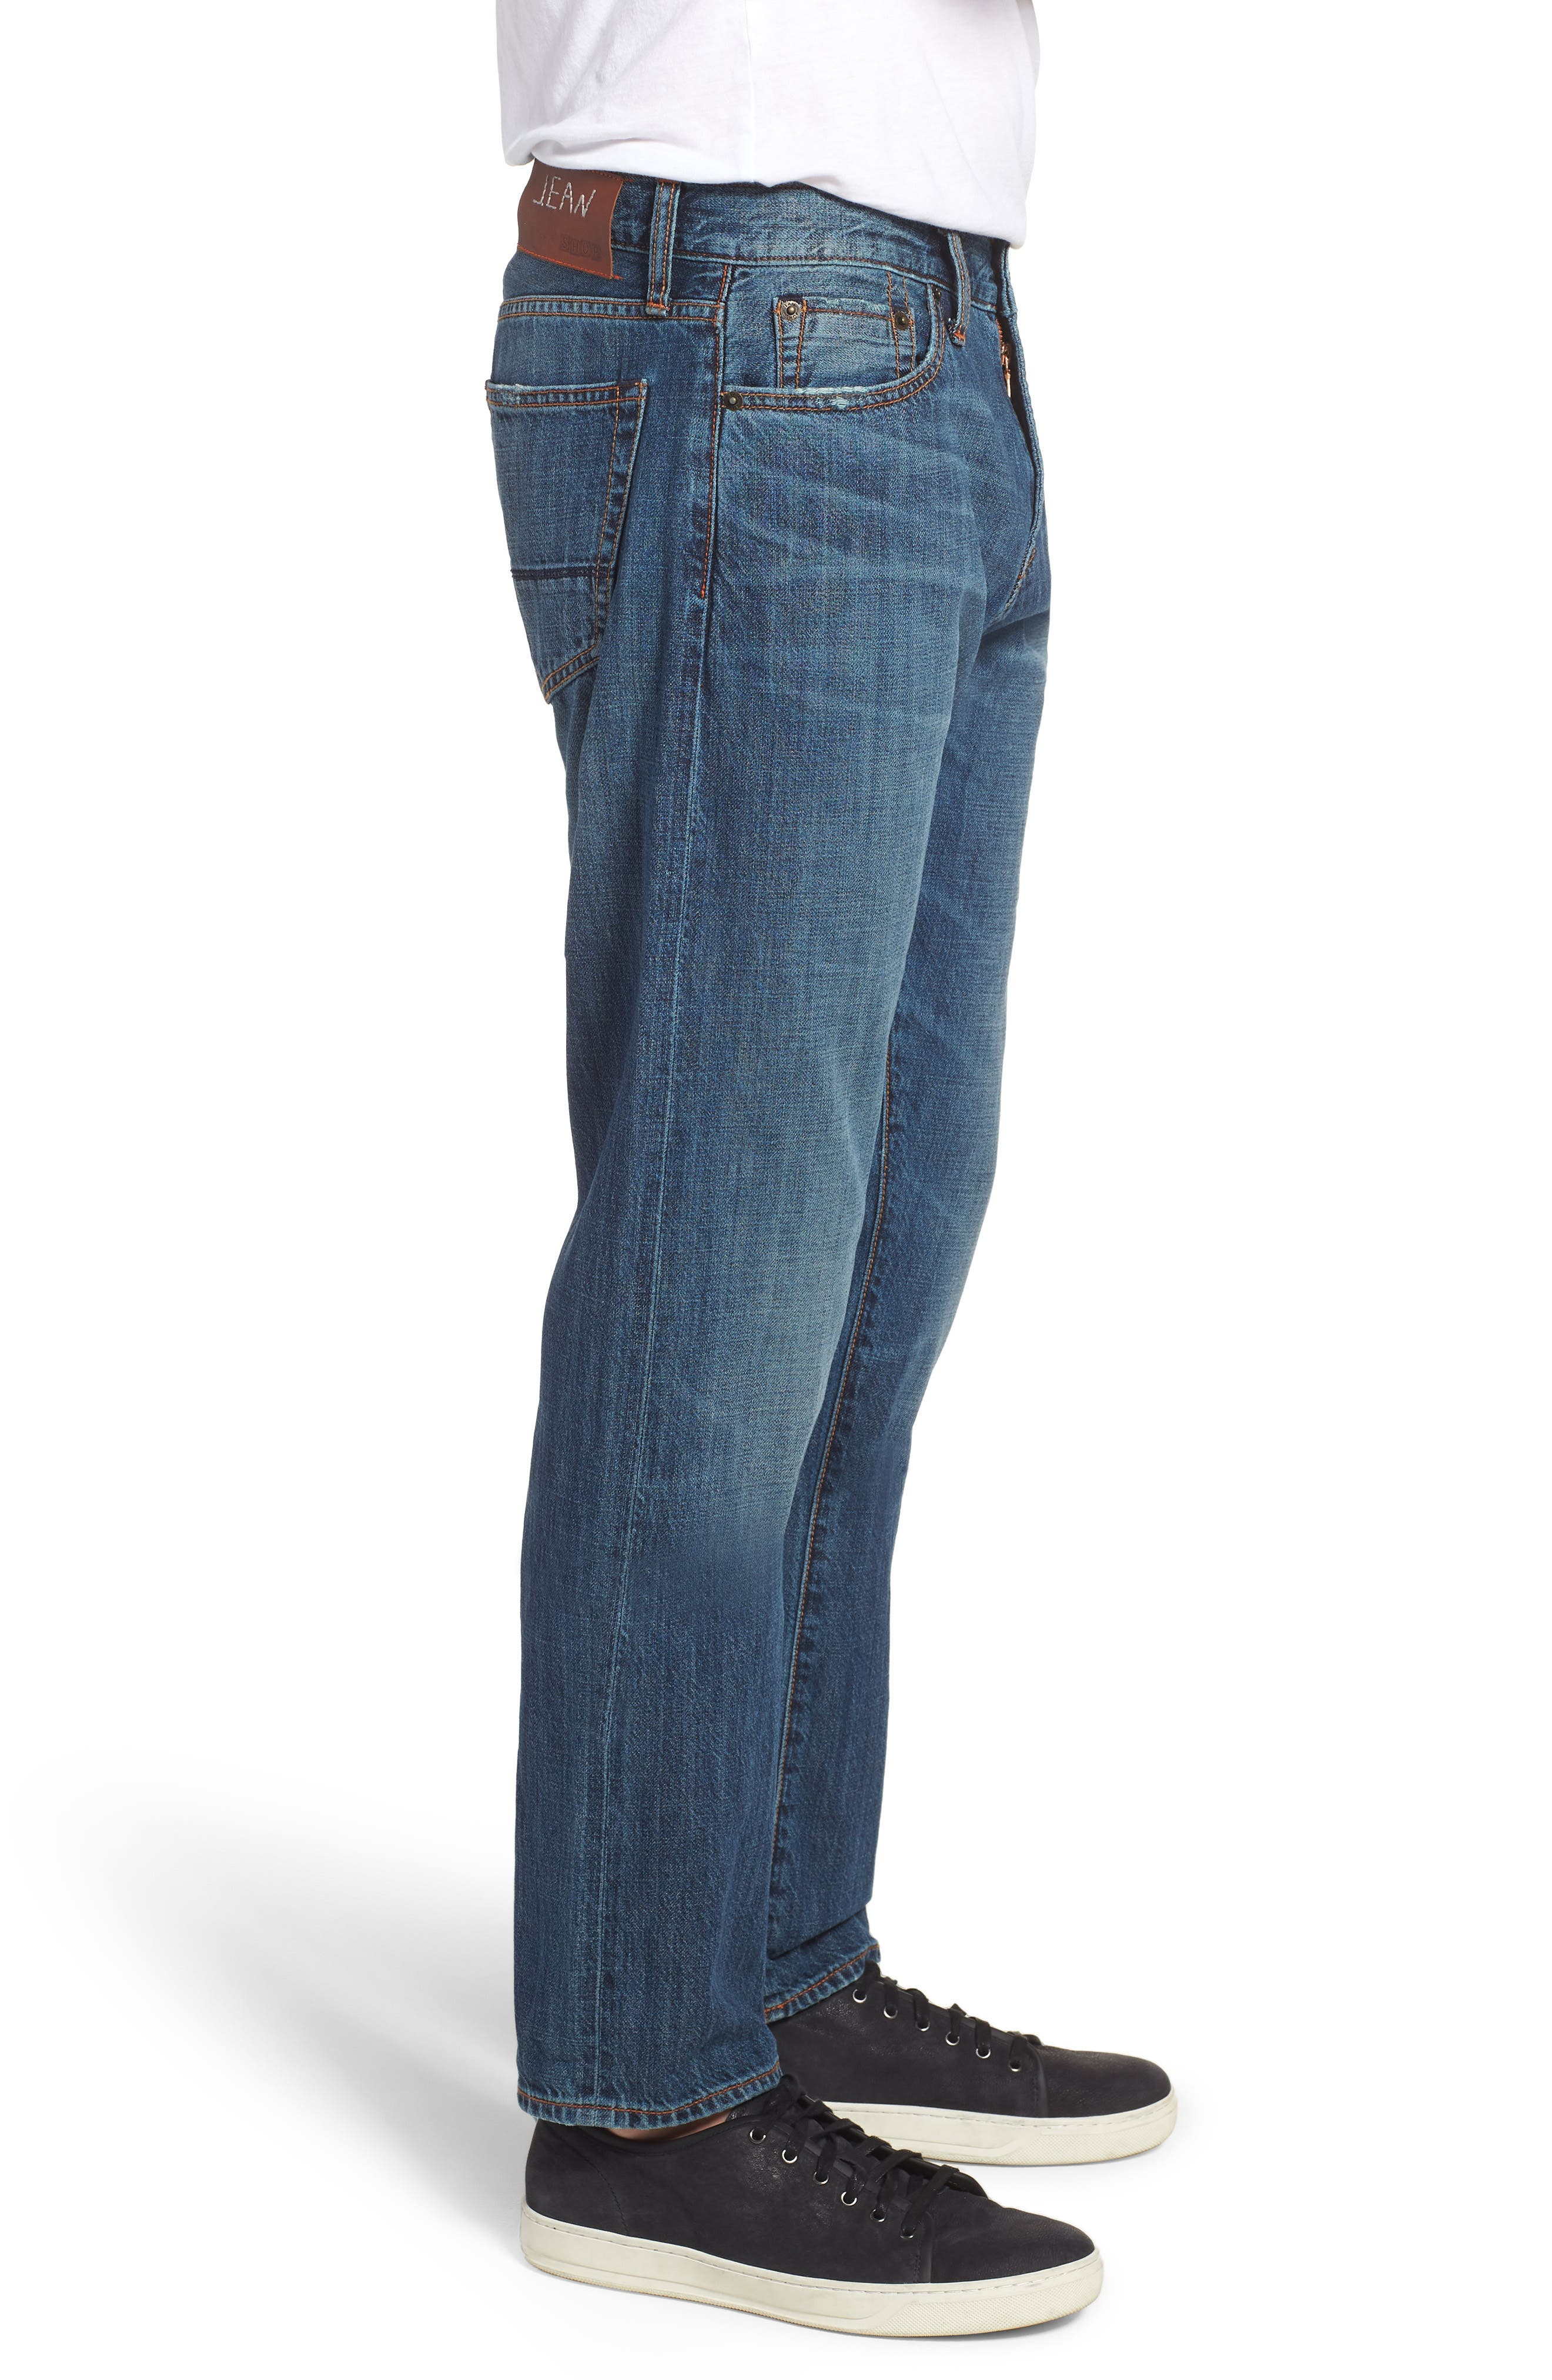 Jim Slim Fit Jeans,                             Alternate thumbnail 3, color,                             Greenwood